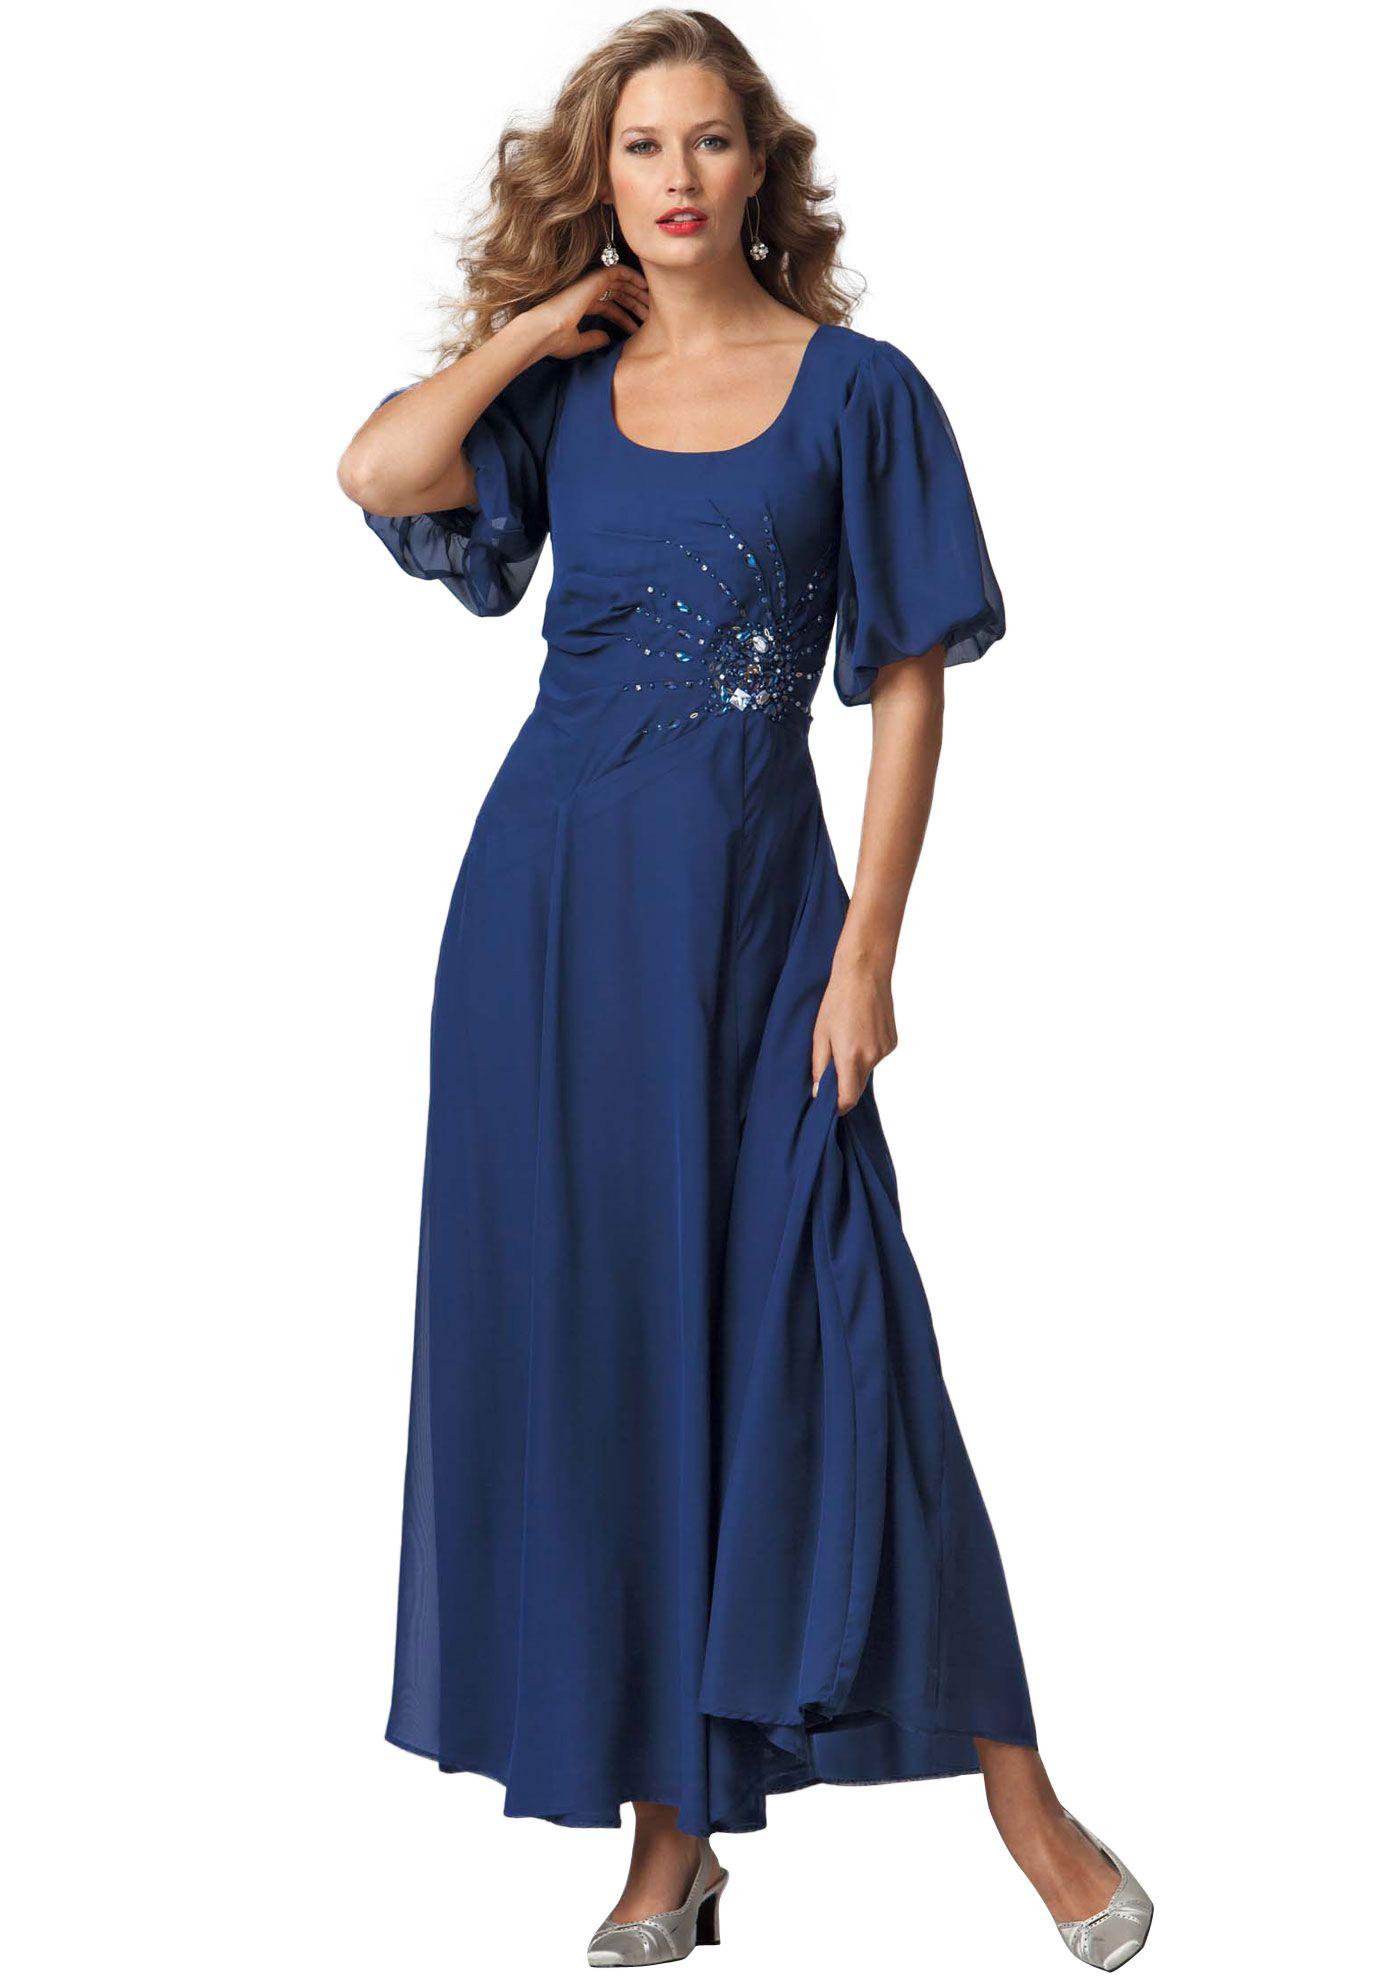 Plus Size Clothing - Fashion for Plus Size women at Roaman\'s ...